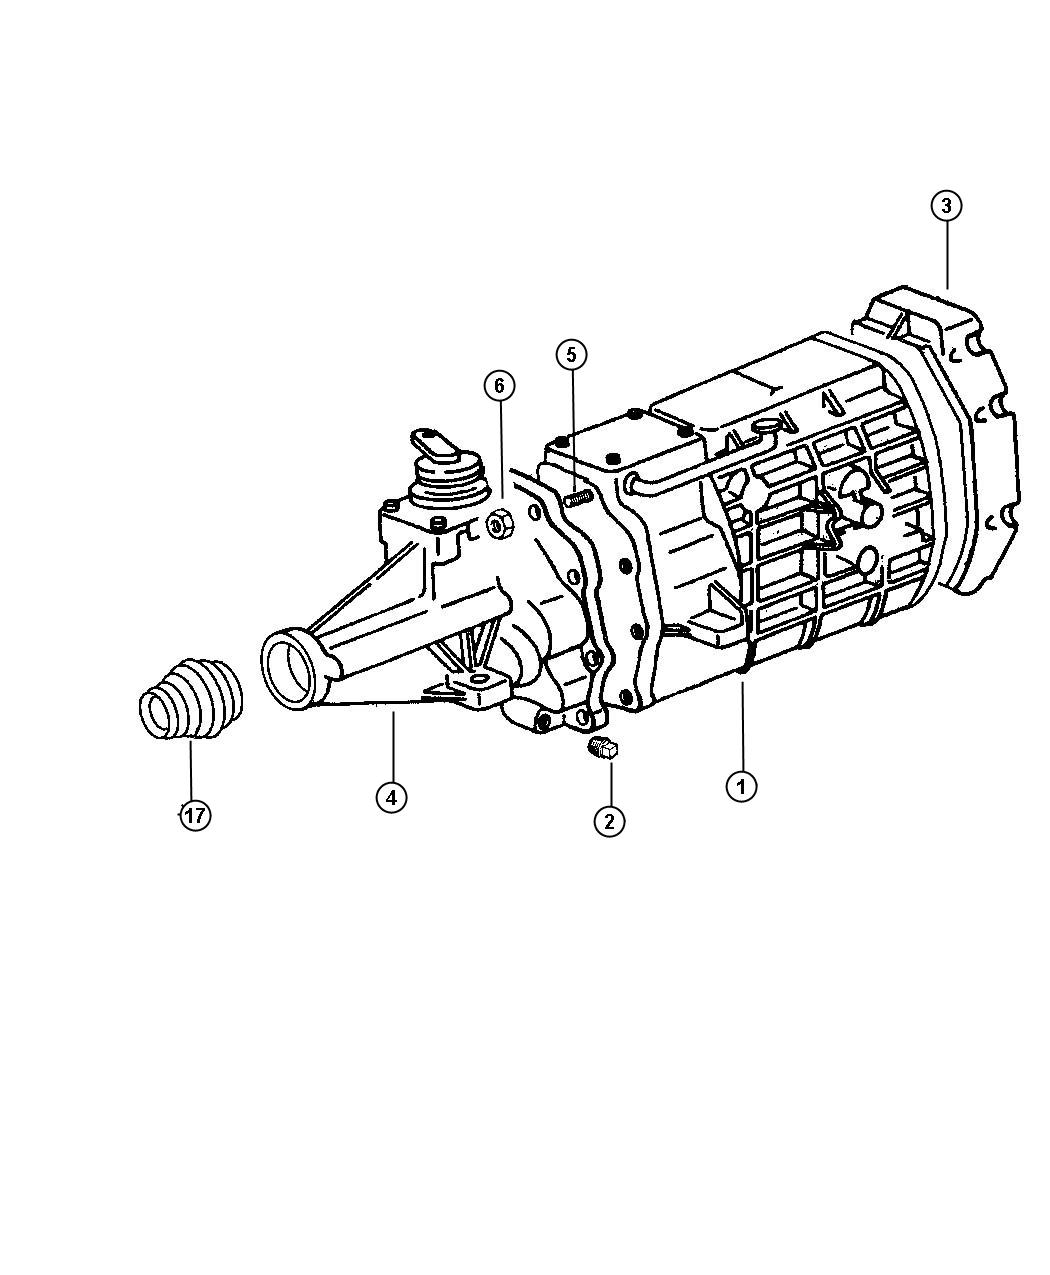 Dodge Viper Case Transmission Clutch Extension